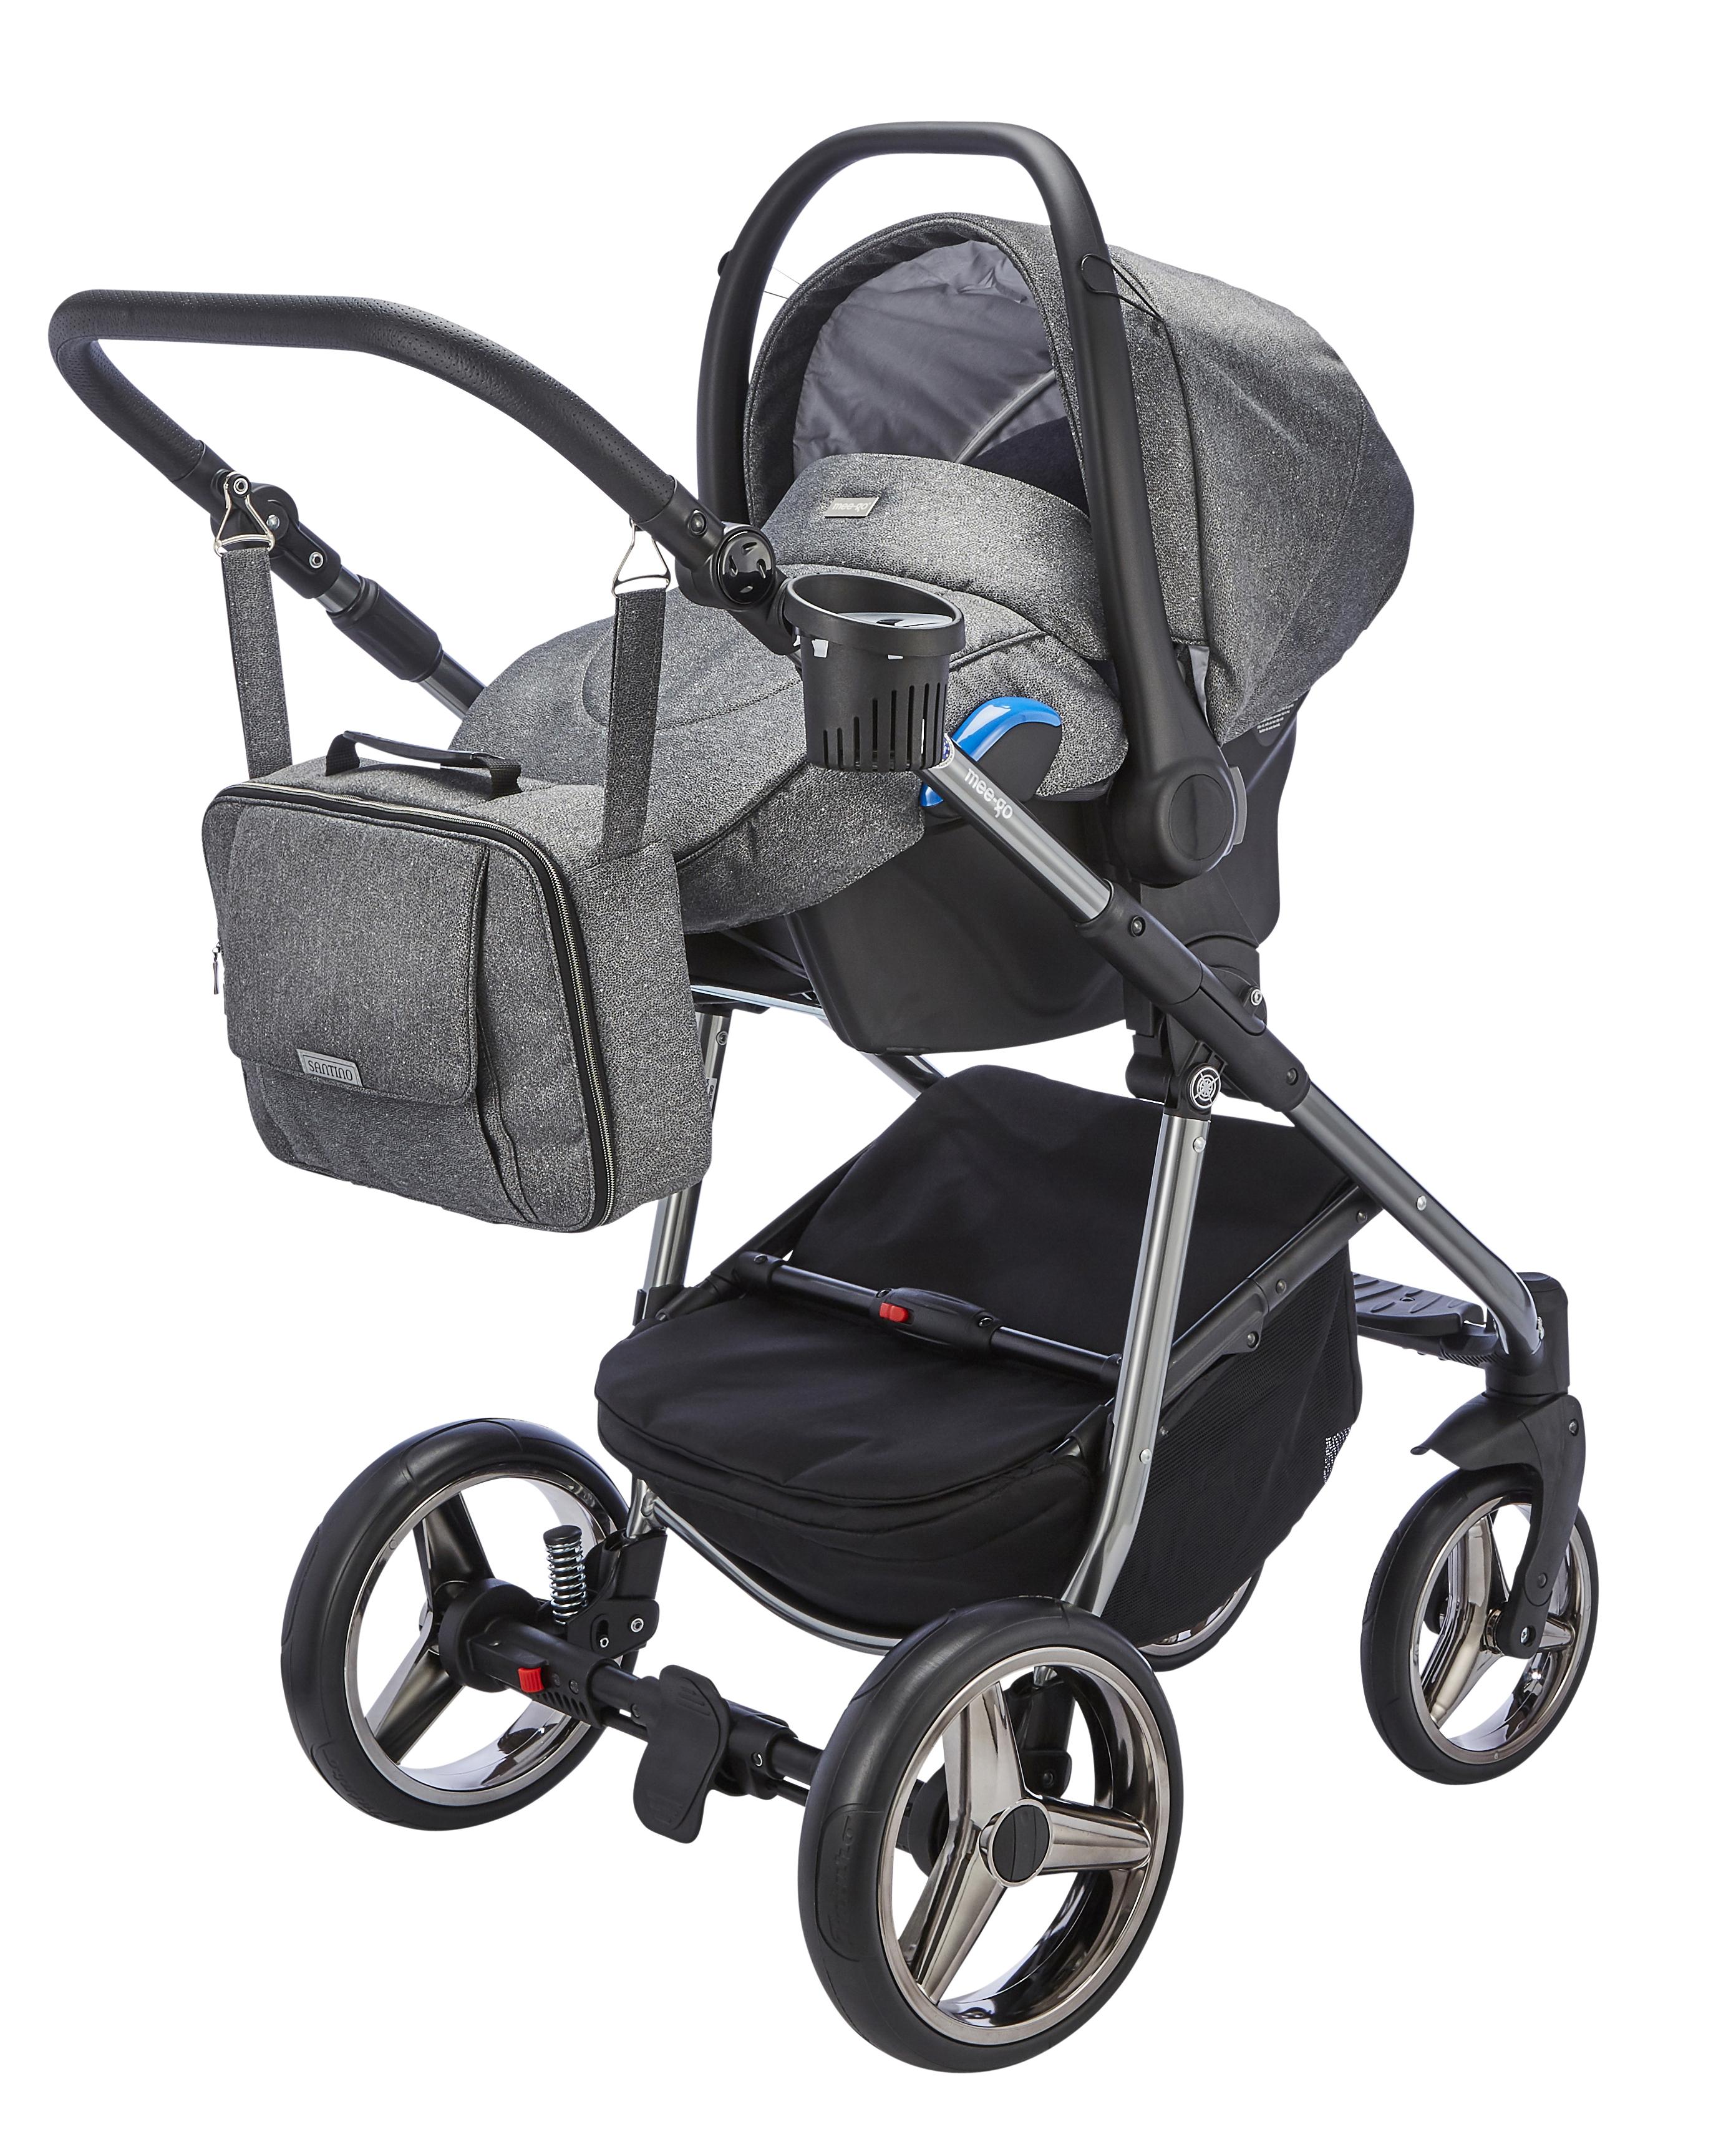 mee-go santino cloud car seat